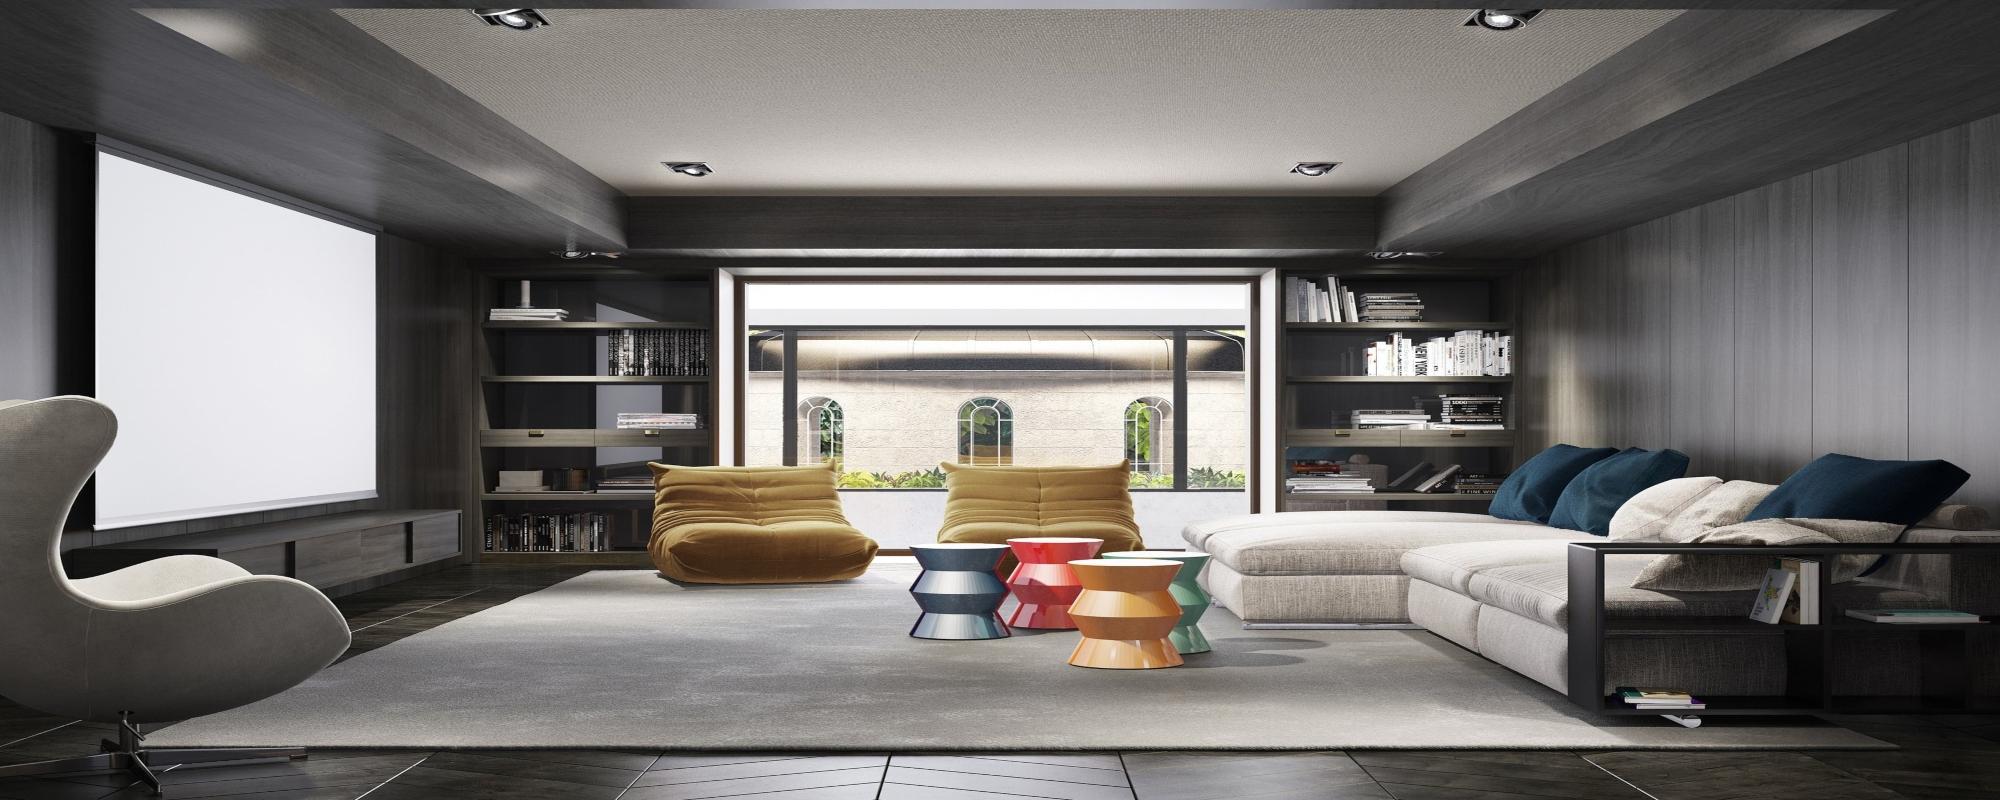 Top Interiorista: Belén Domercq una referencia en diseño de interior top interiorista Top Interiorista: Belén Domecq una referencia en diseño de interior Featured 12